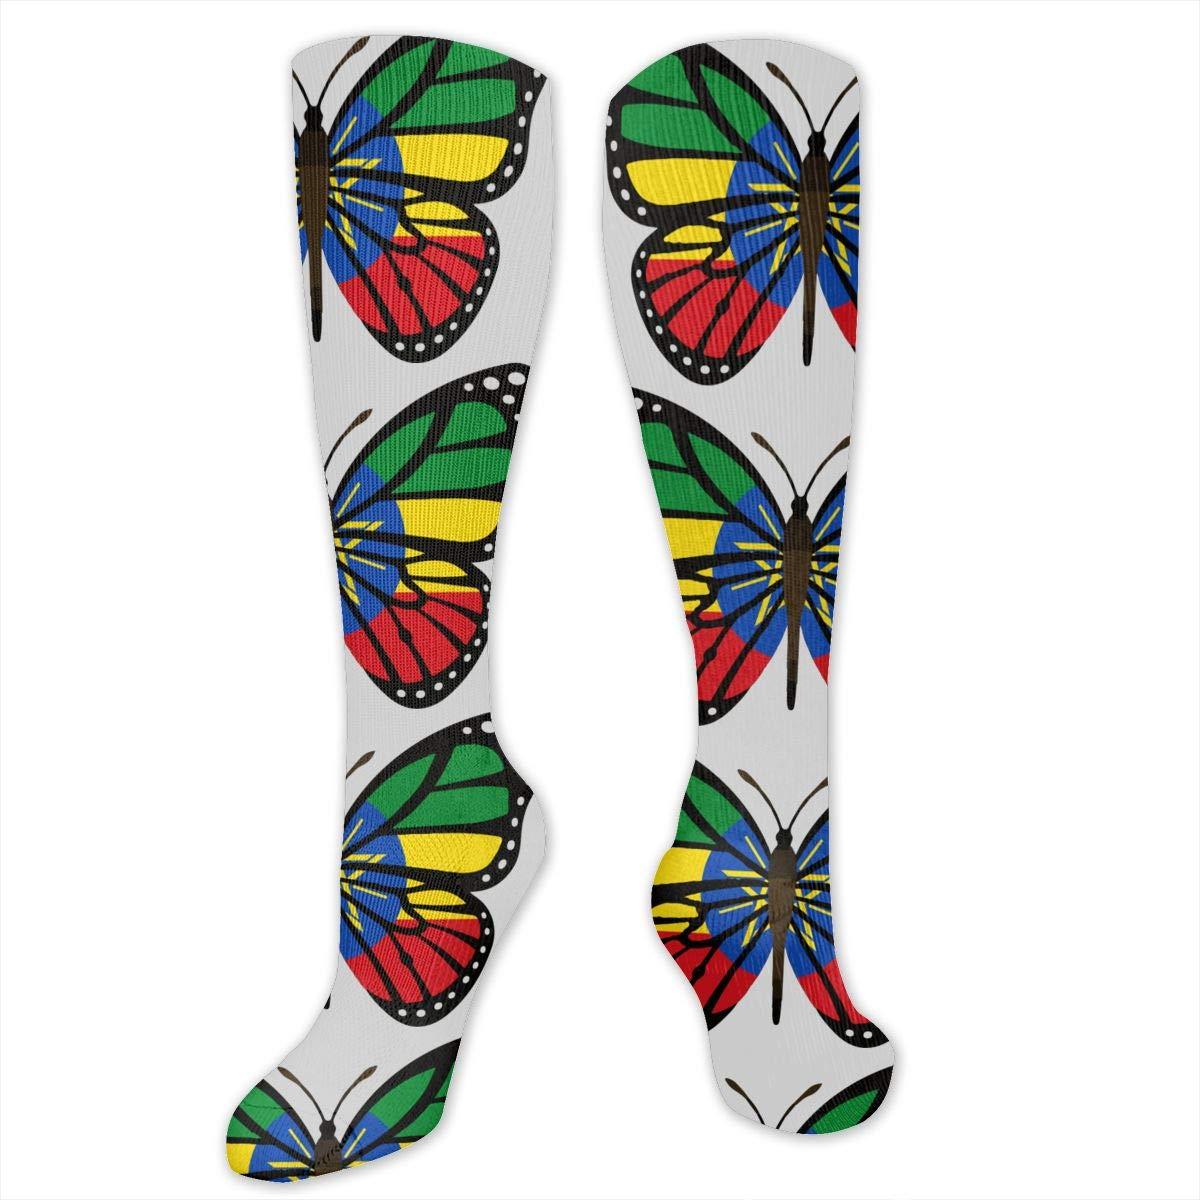 Unisex ButterFlag Ethiopia Flag Knee High Compression Thigh High Socks Soft Socks